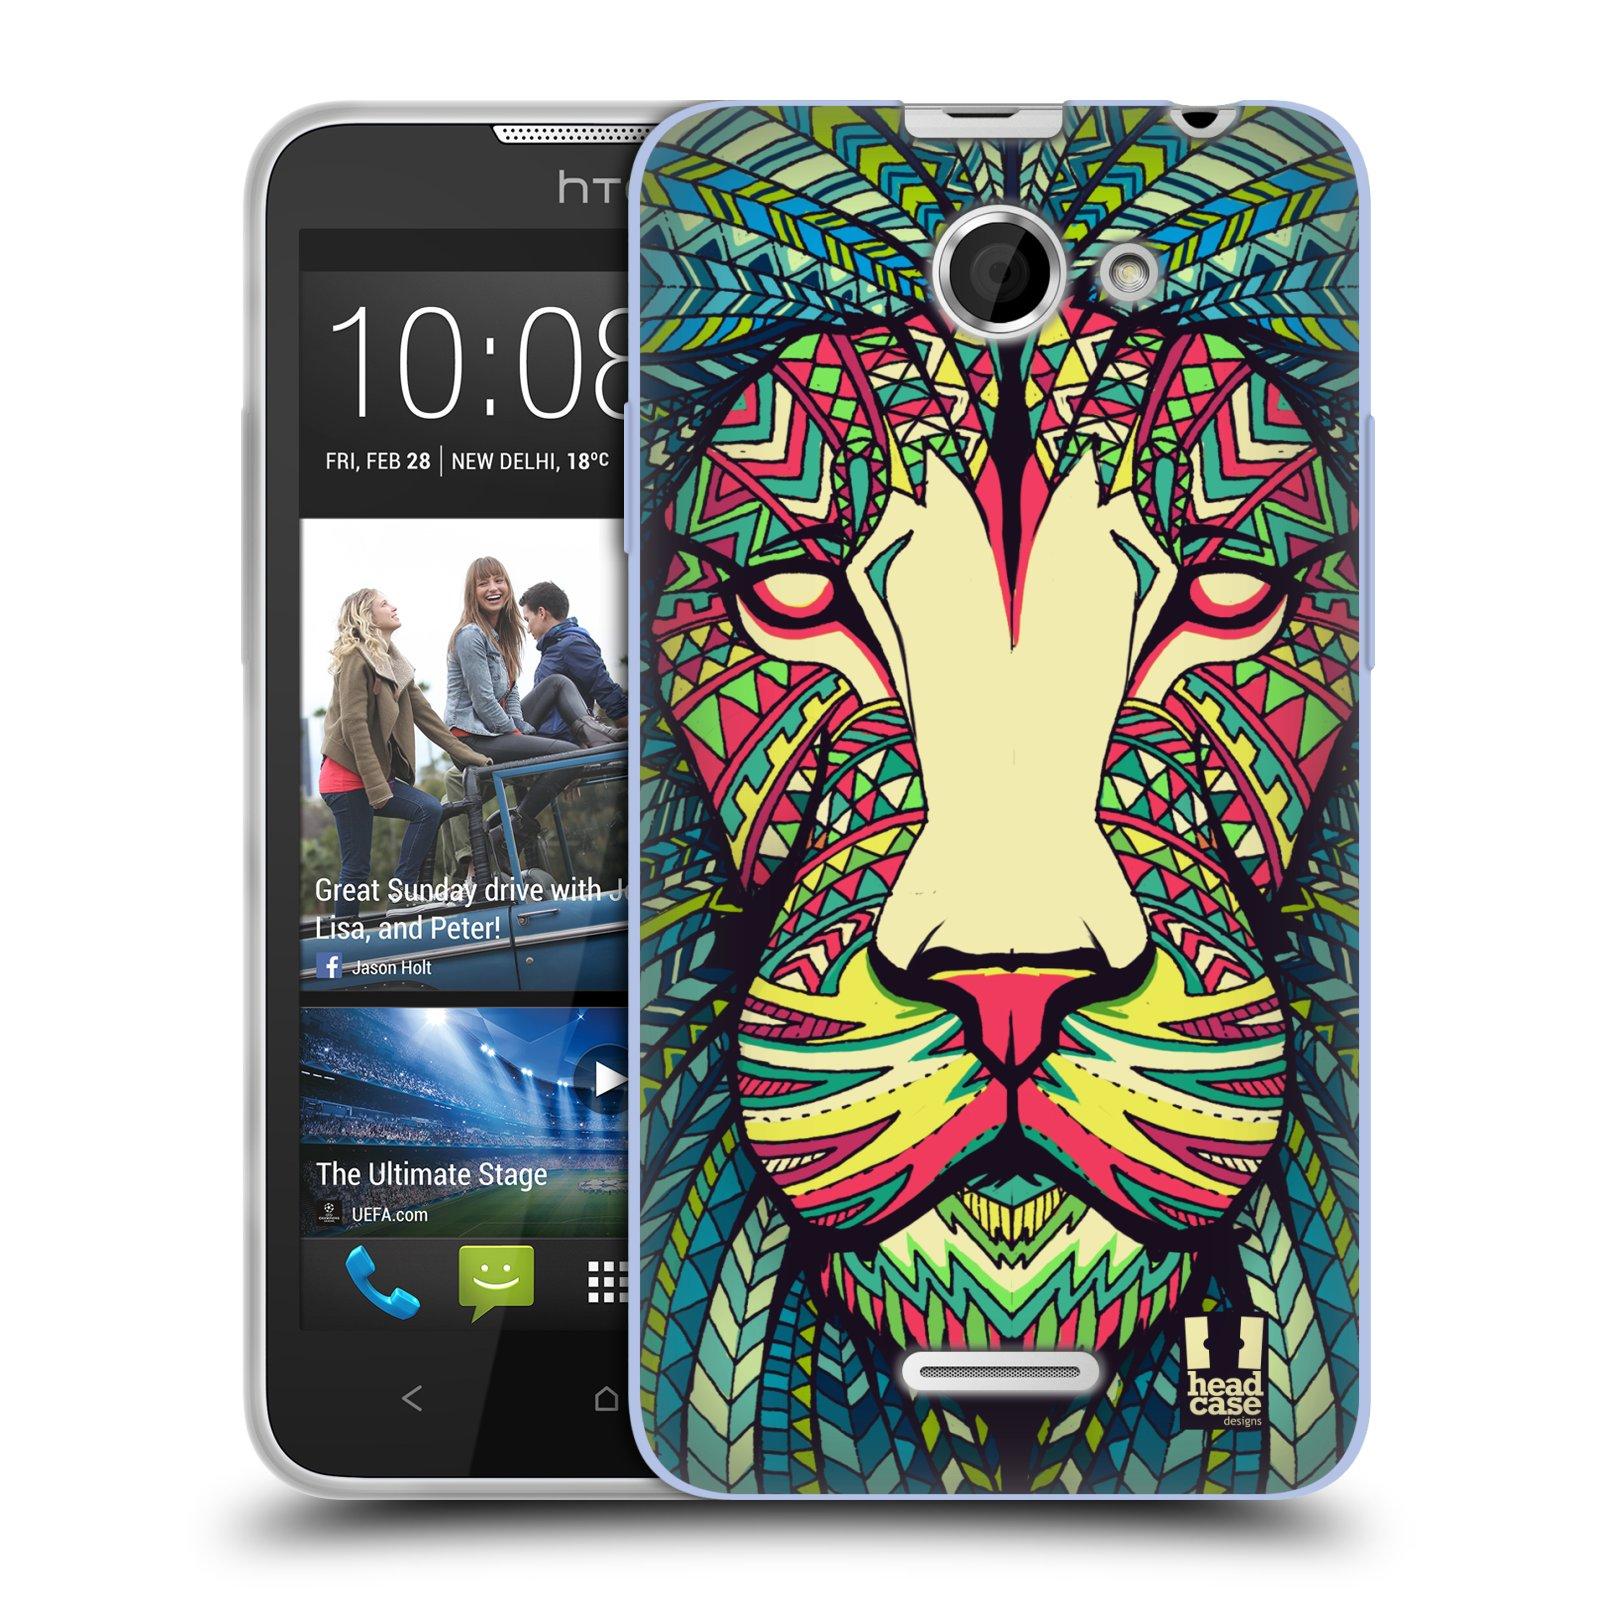 Silikonové pouzdro na mobil HTC Desire 516 HEAD CASE AZTEC LEV (Silikonový kryt či obal na mobilní telefon HTC Desire 516 Dual SIM)